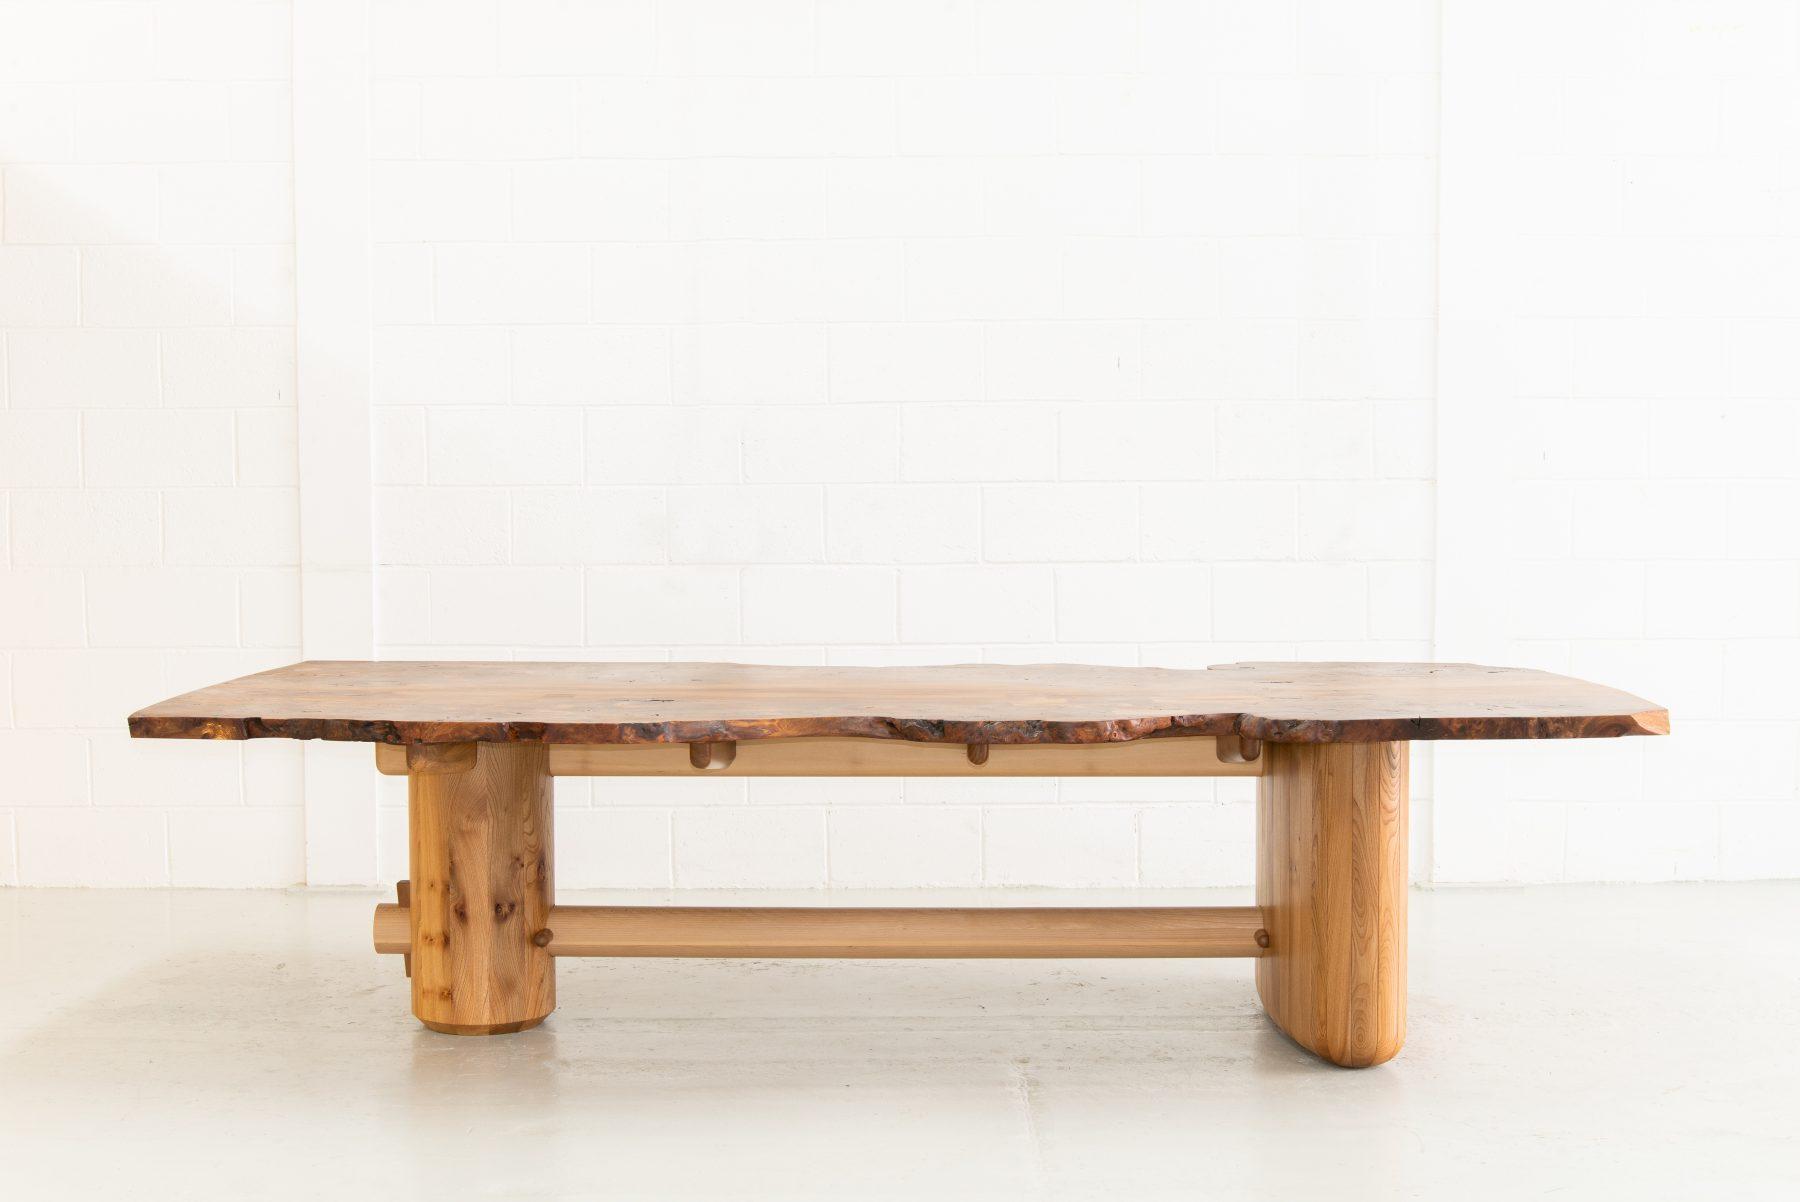 Jan Hendzel Studio Naama Table1